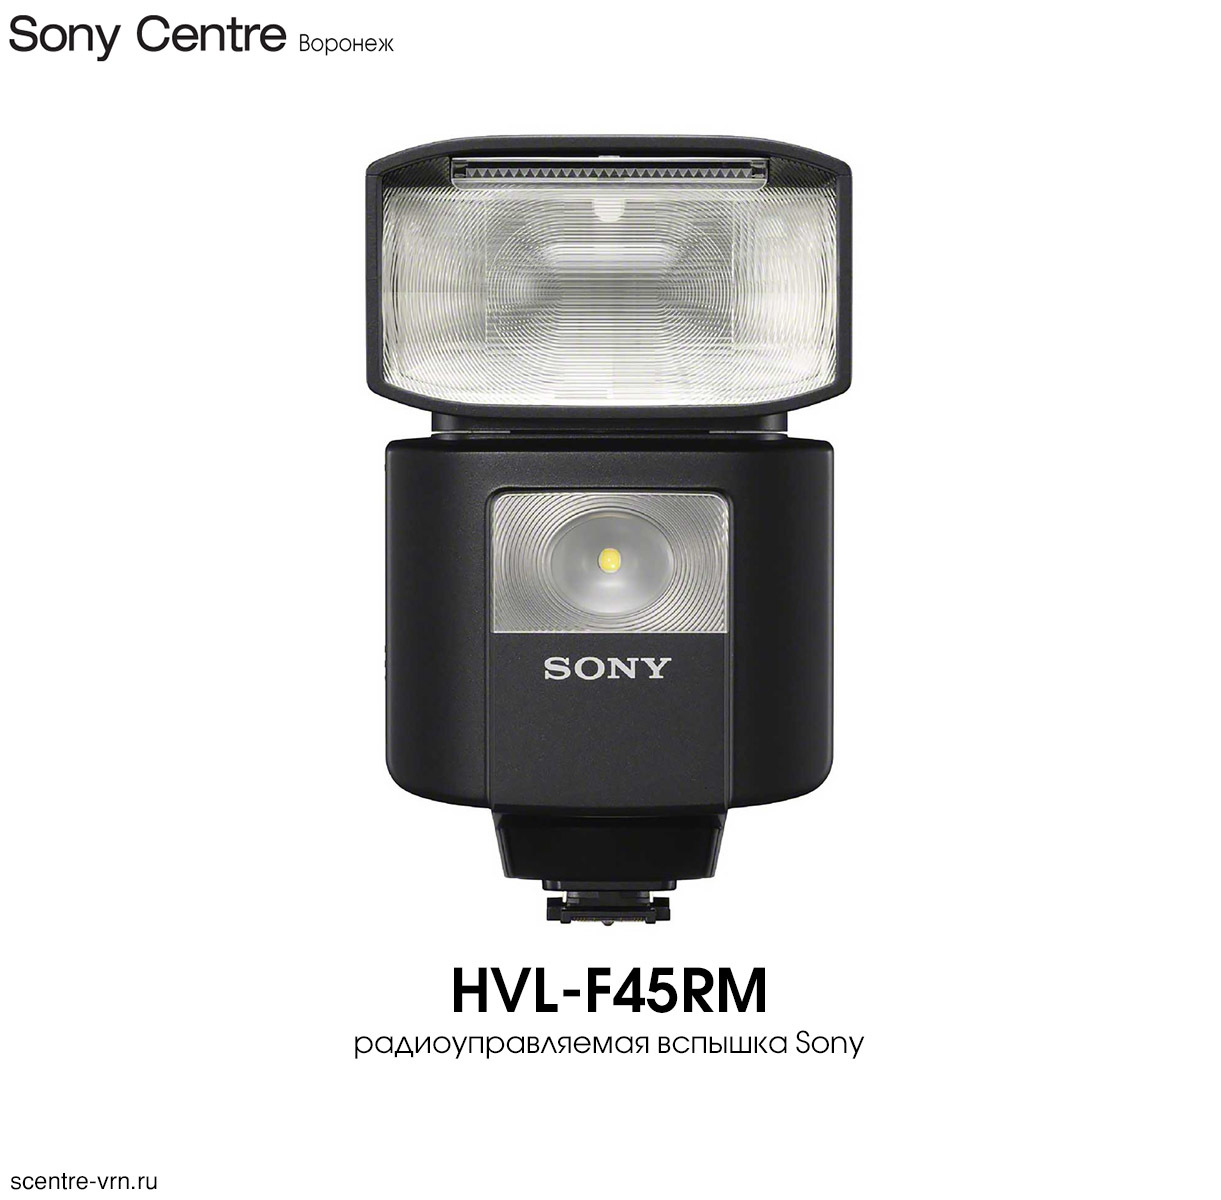 Вспышка Sony HVL-F45RM